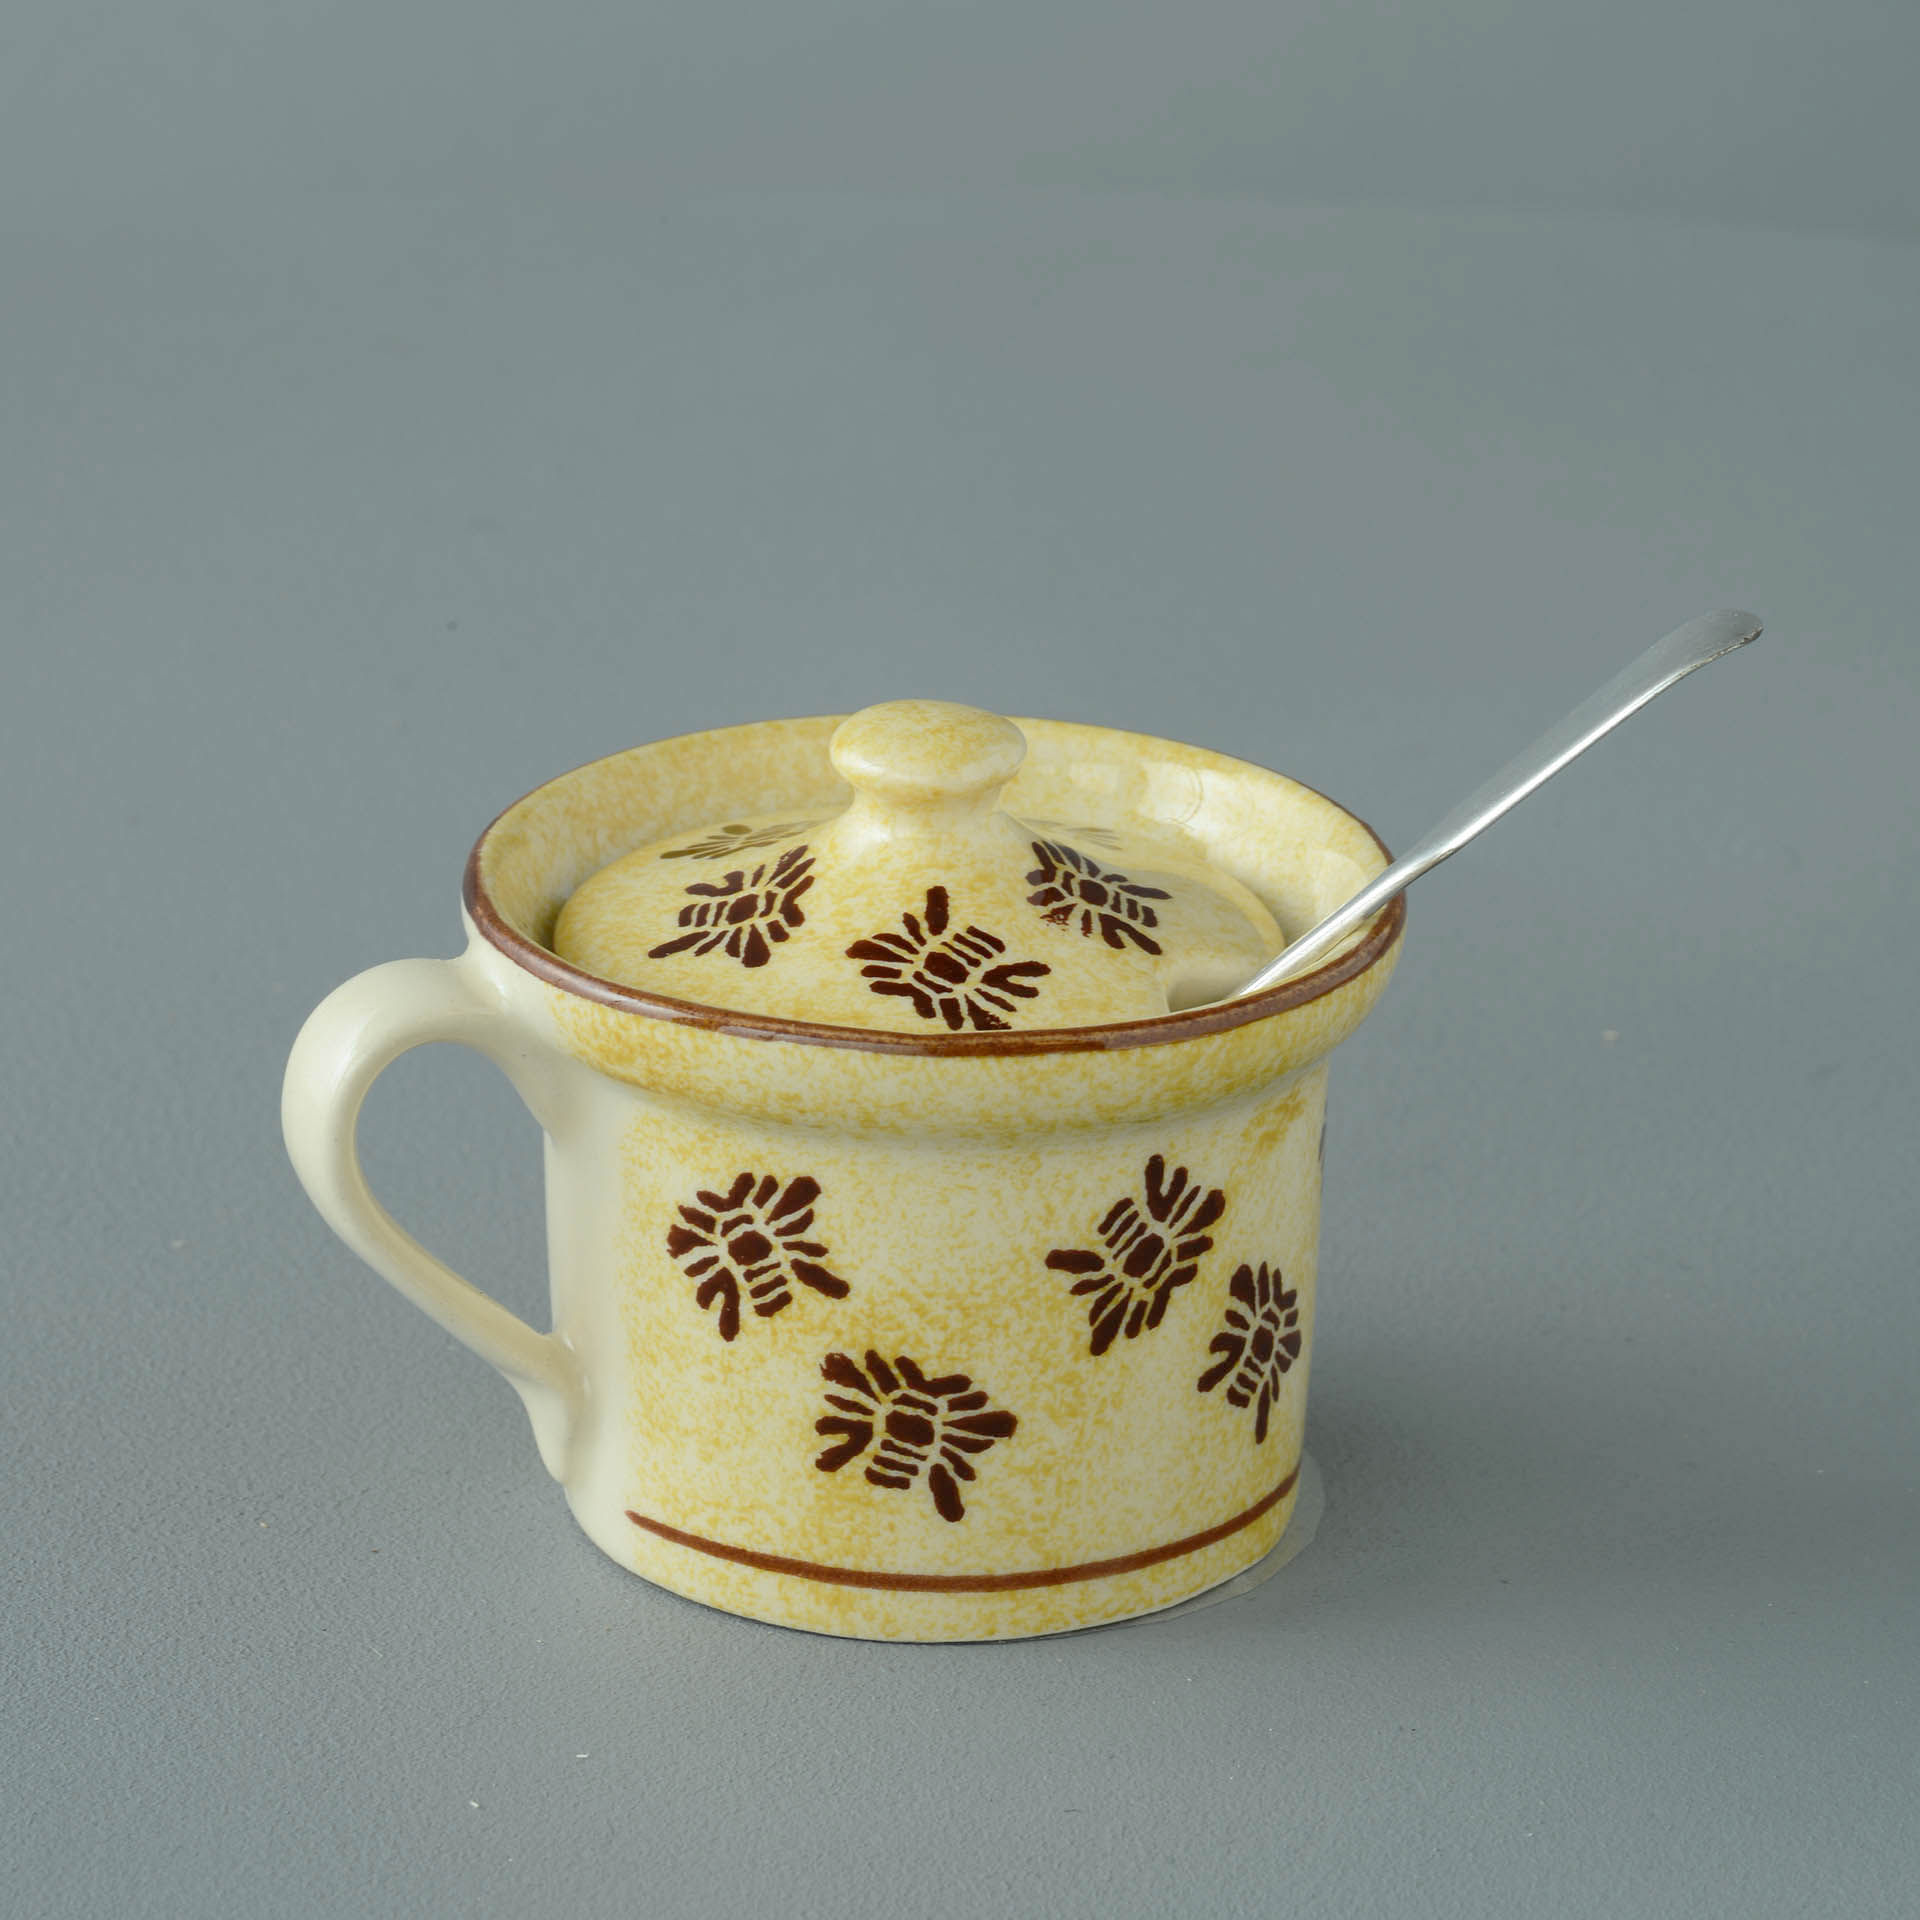 Bees Mustard Pot 7.8(w) x 5.4(h) cm